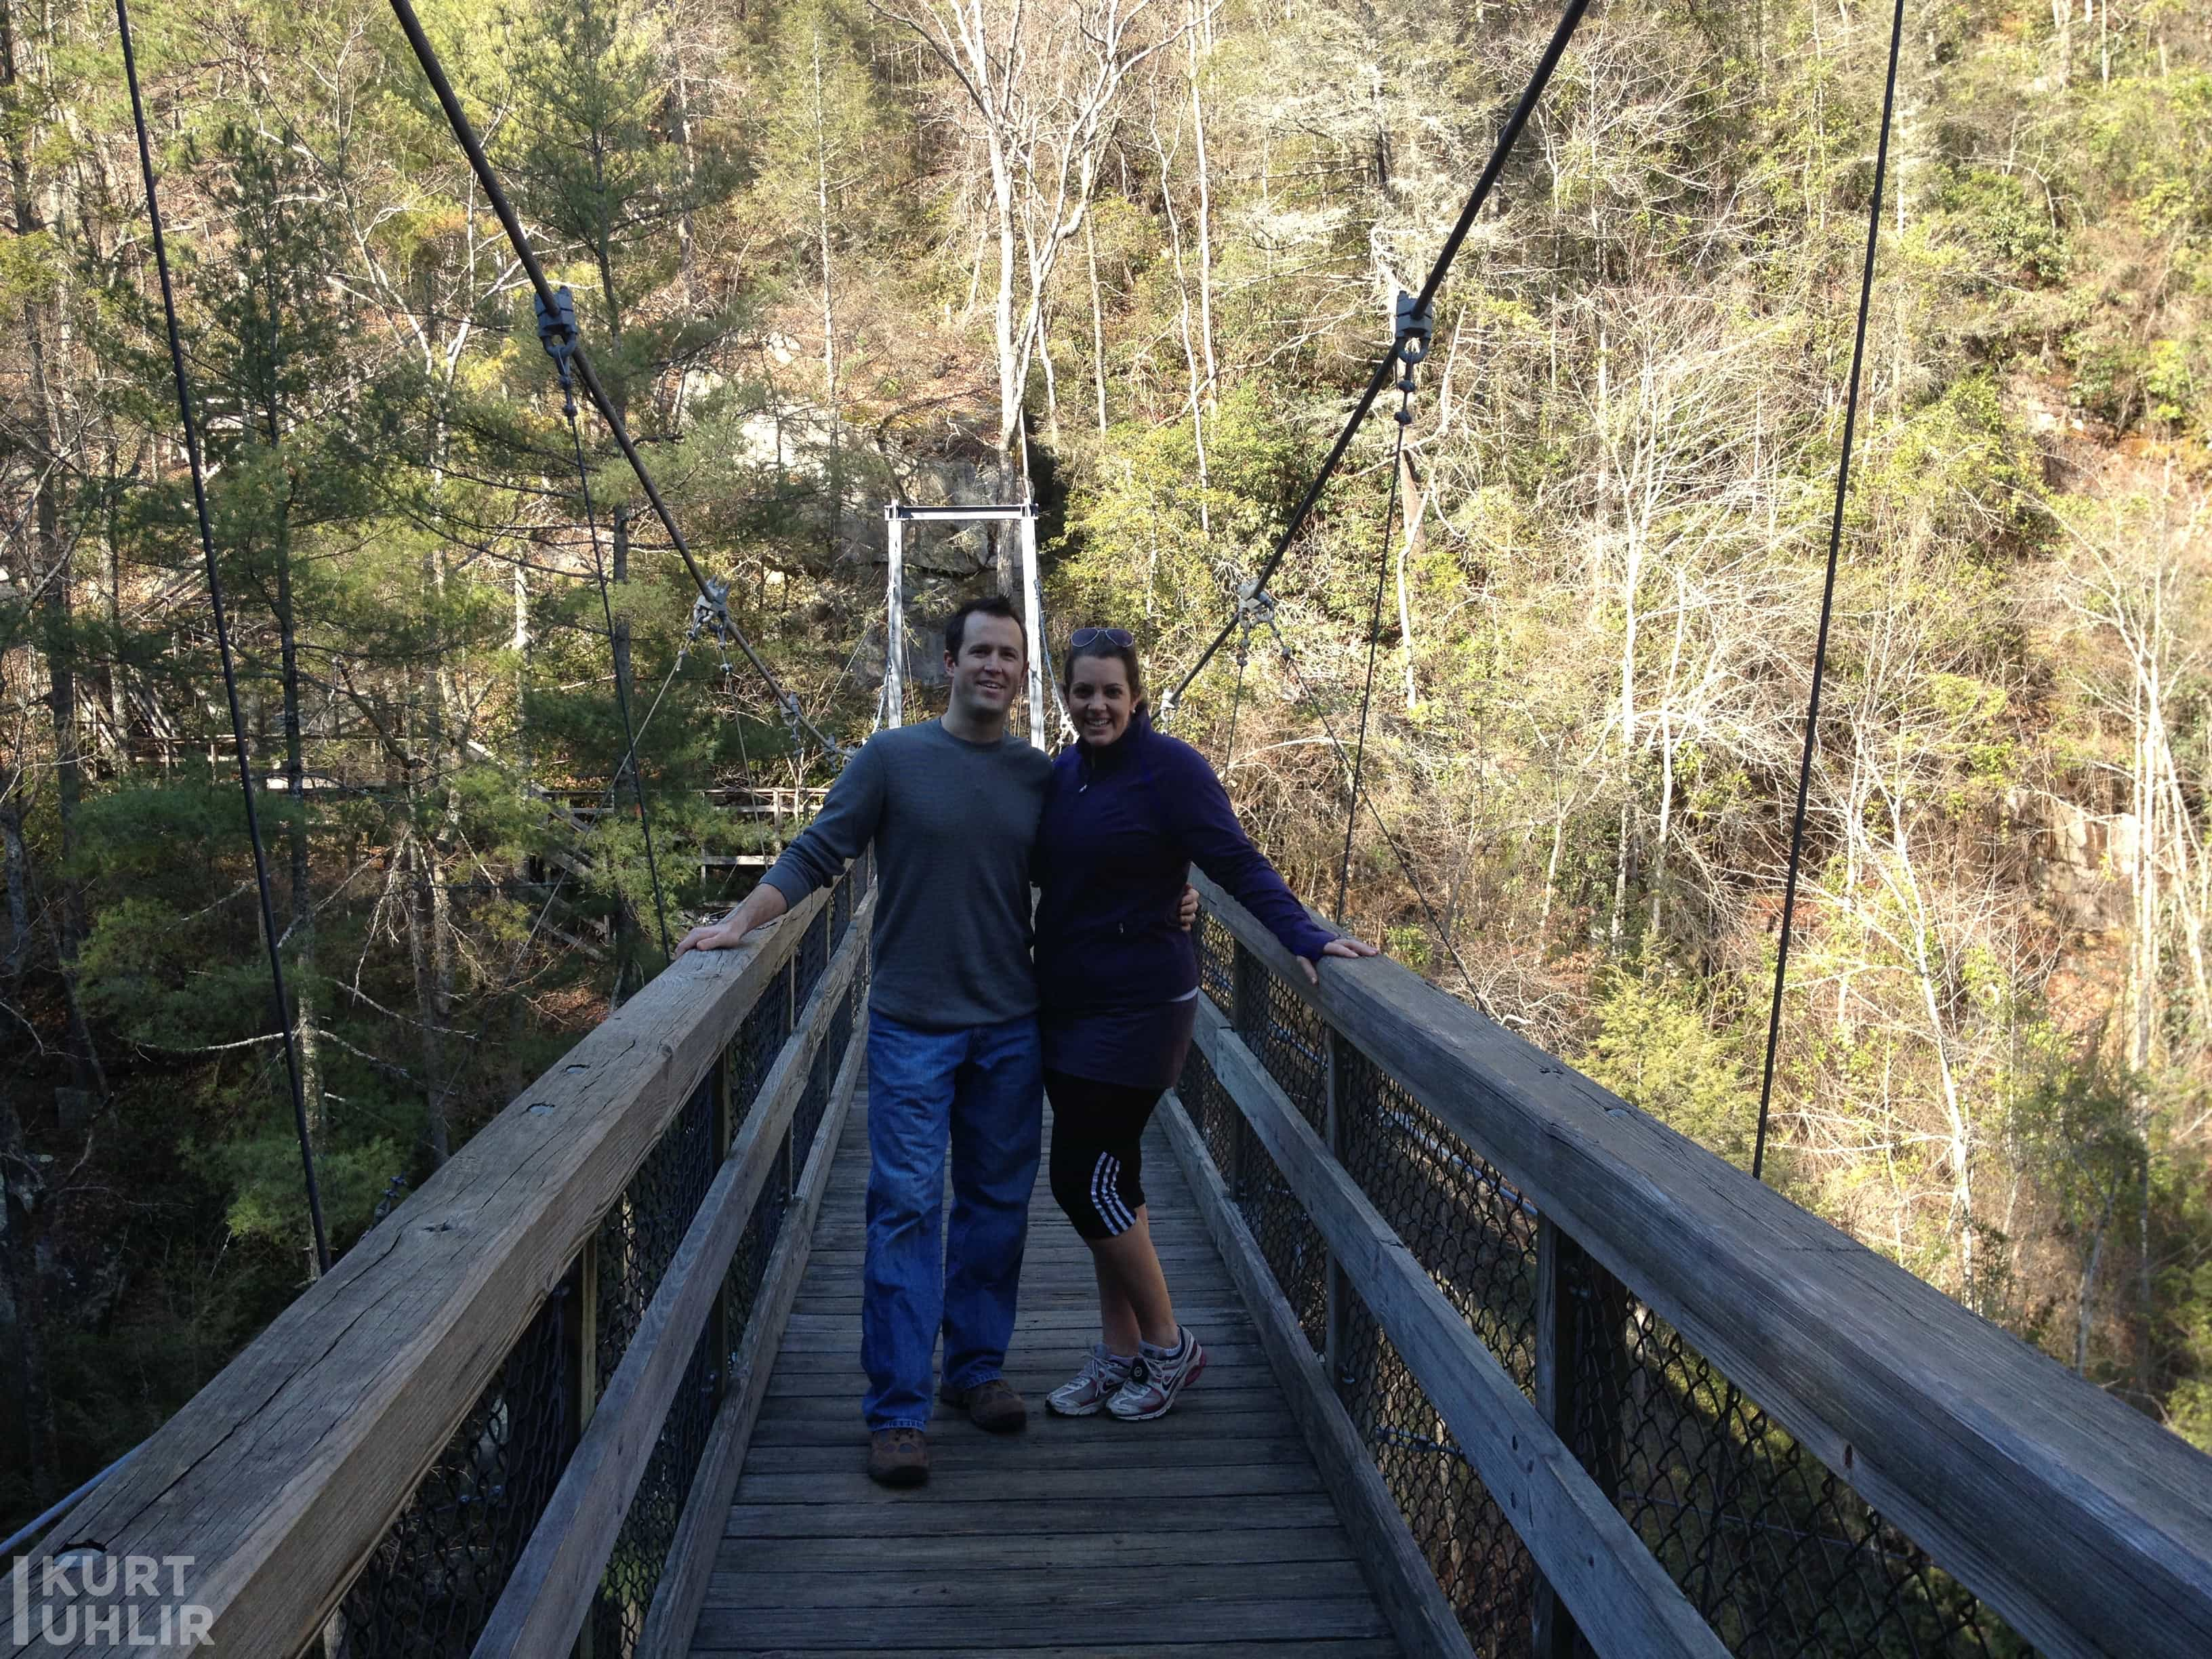 Tallulah Gorge State Park - Valerie and Kurt Uhlir